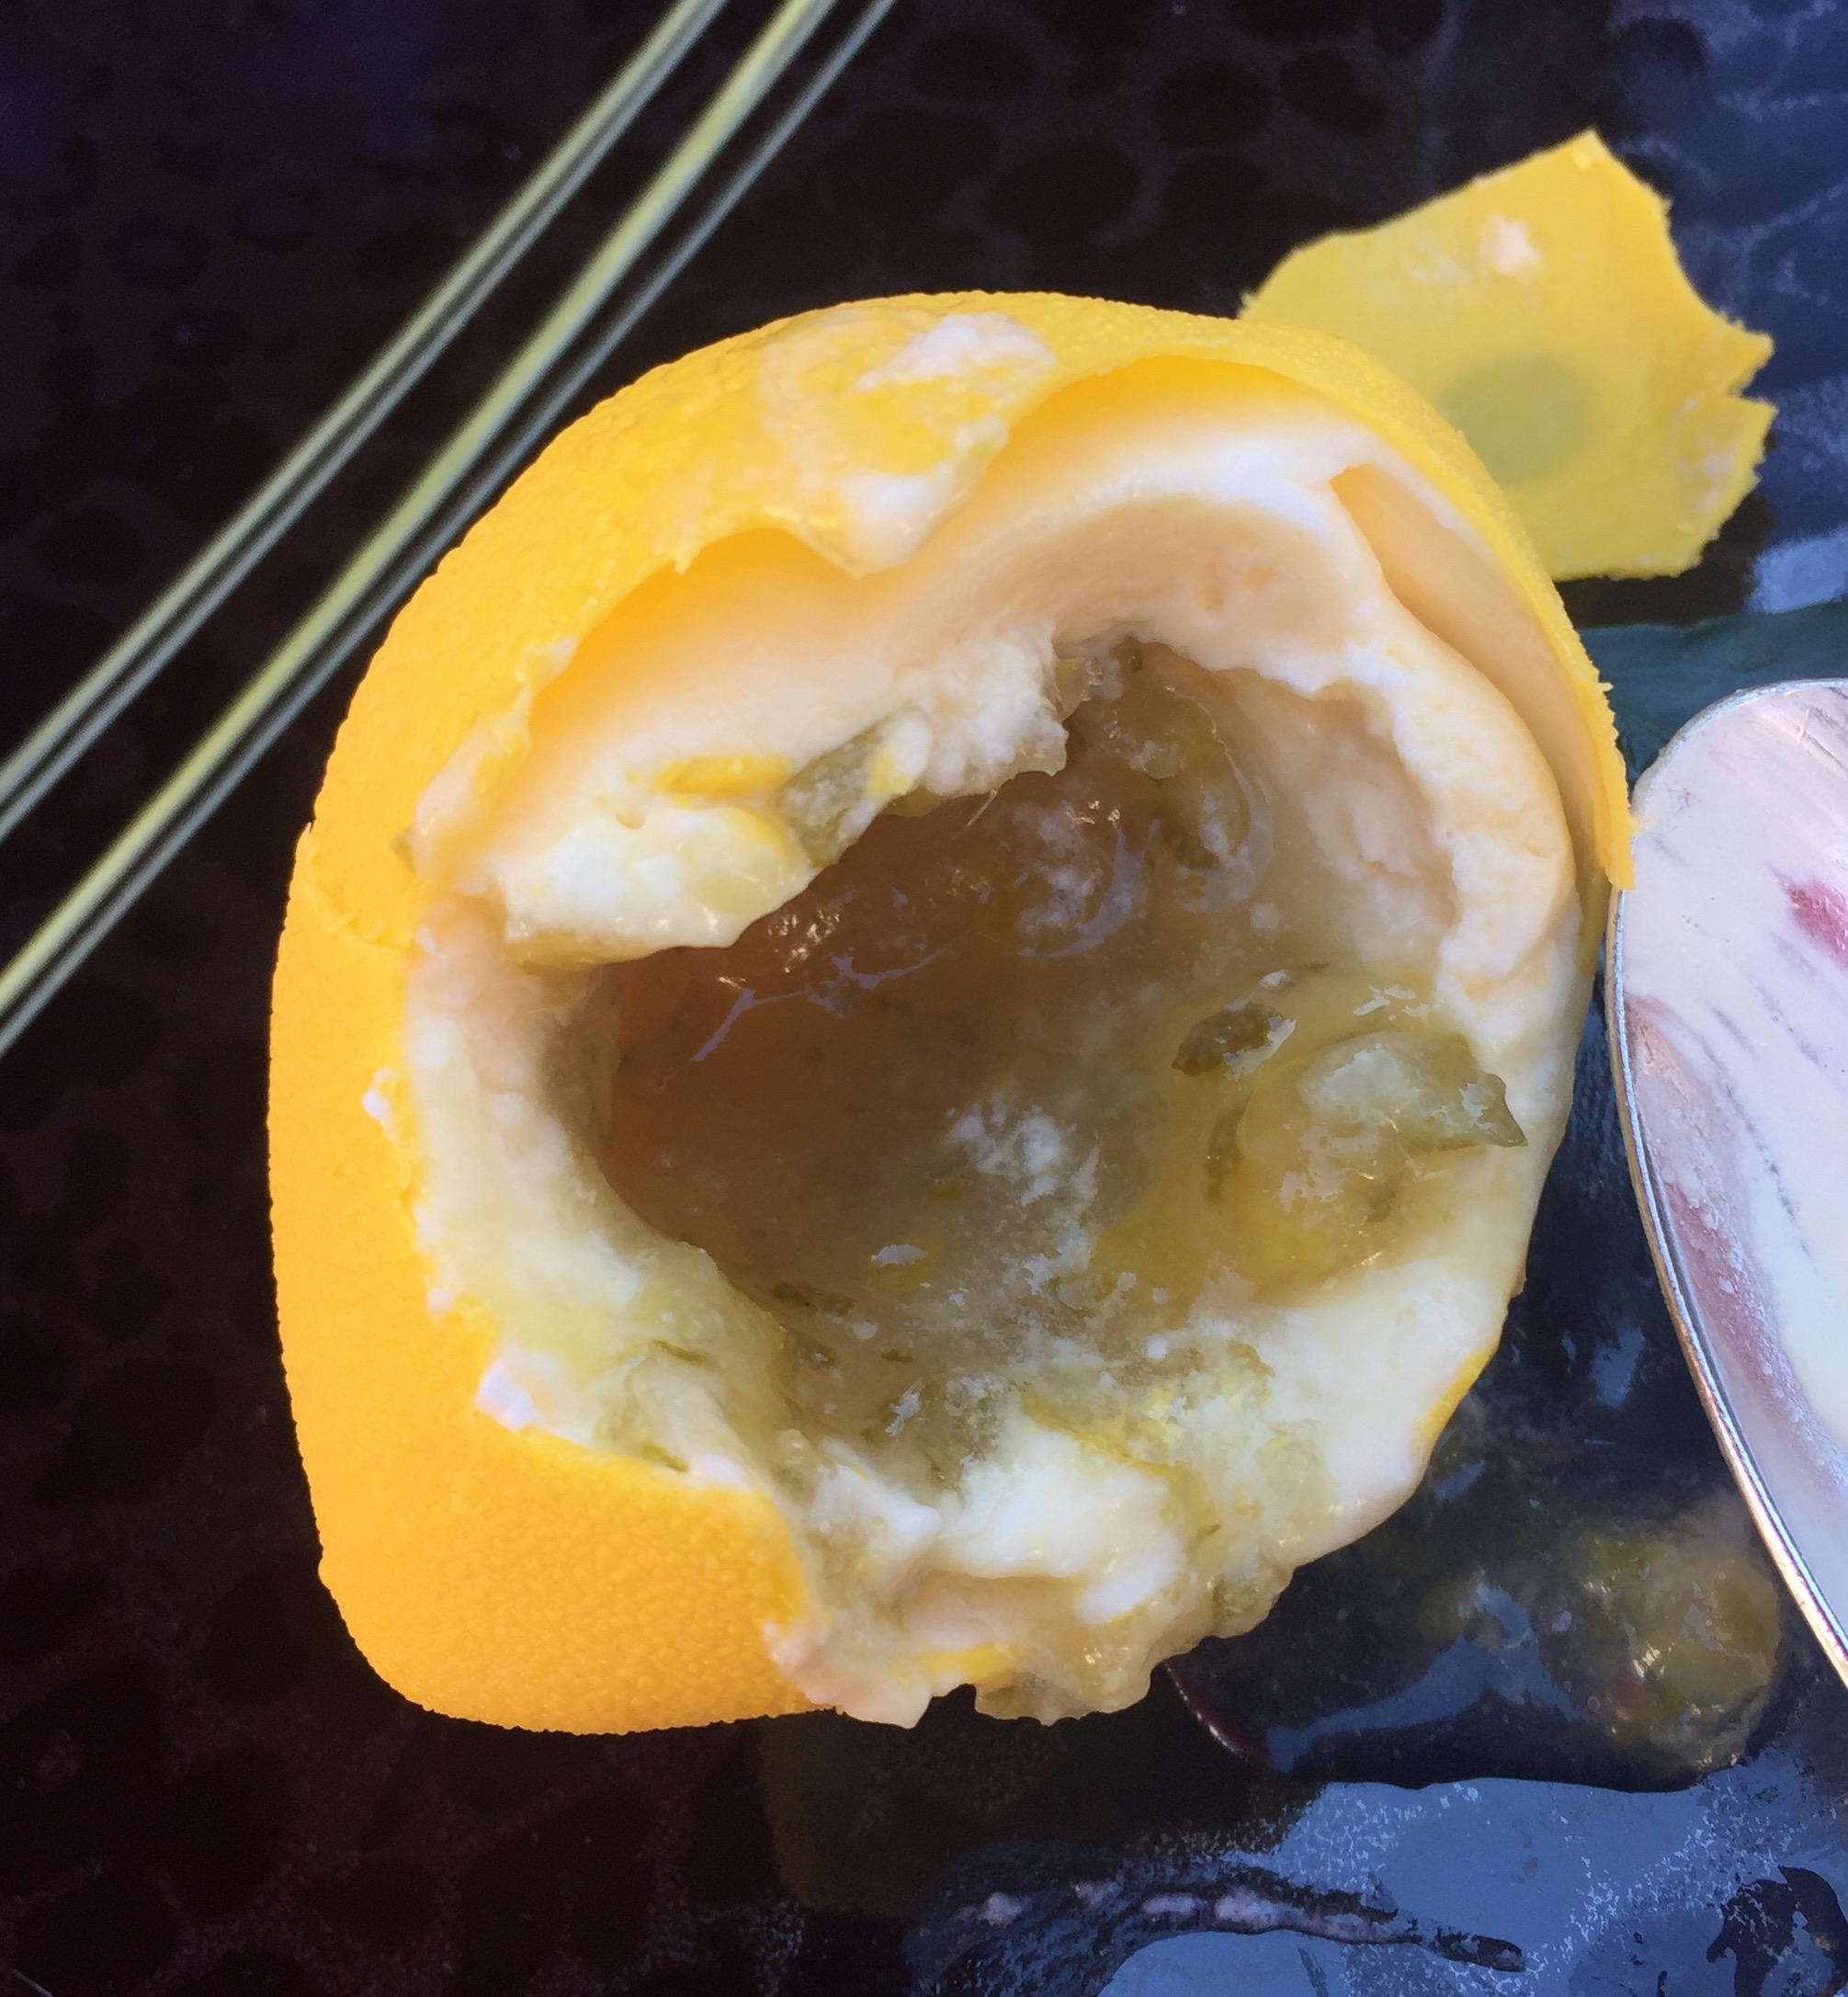 Lemon sorbet filled with super sour lemon jelly - It was like a Kinder surprise of sourness